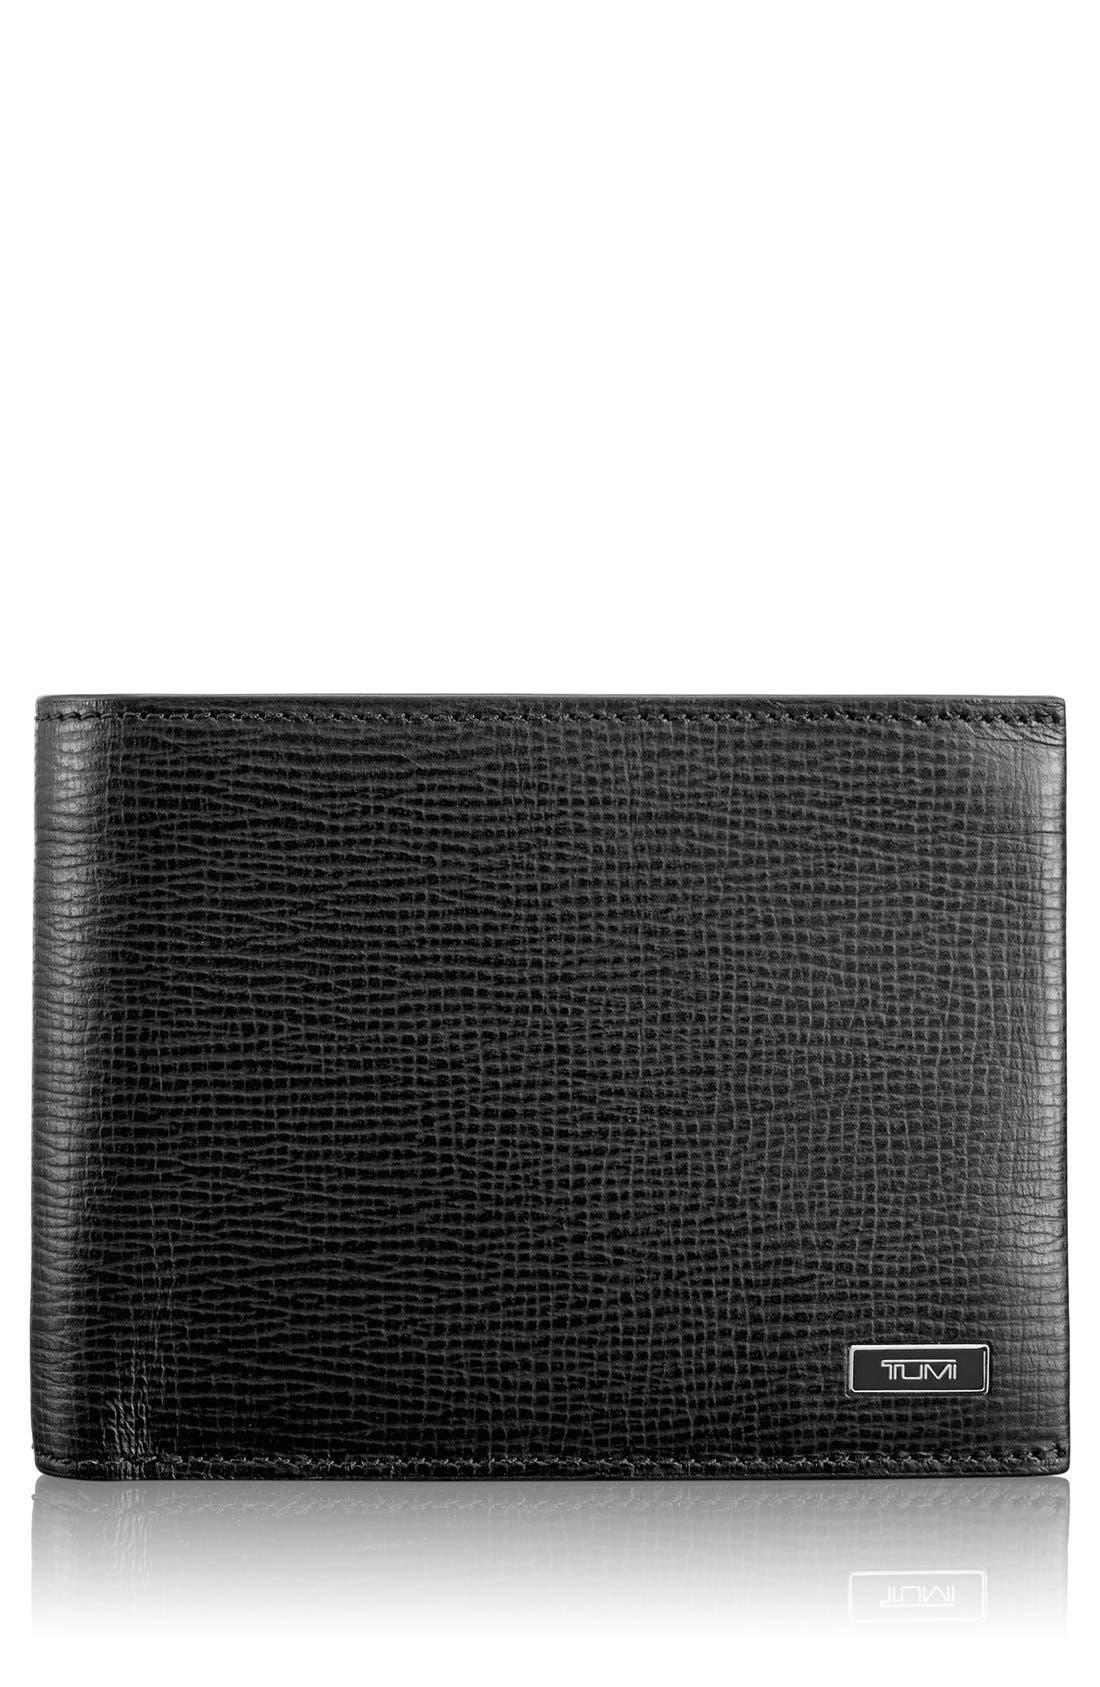 Monaco Global Double Billfold Leather Wallet,                             Main thumbnail 1, color,                             001